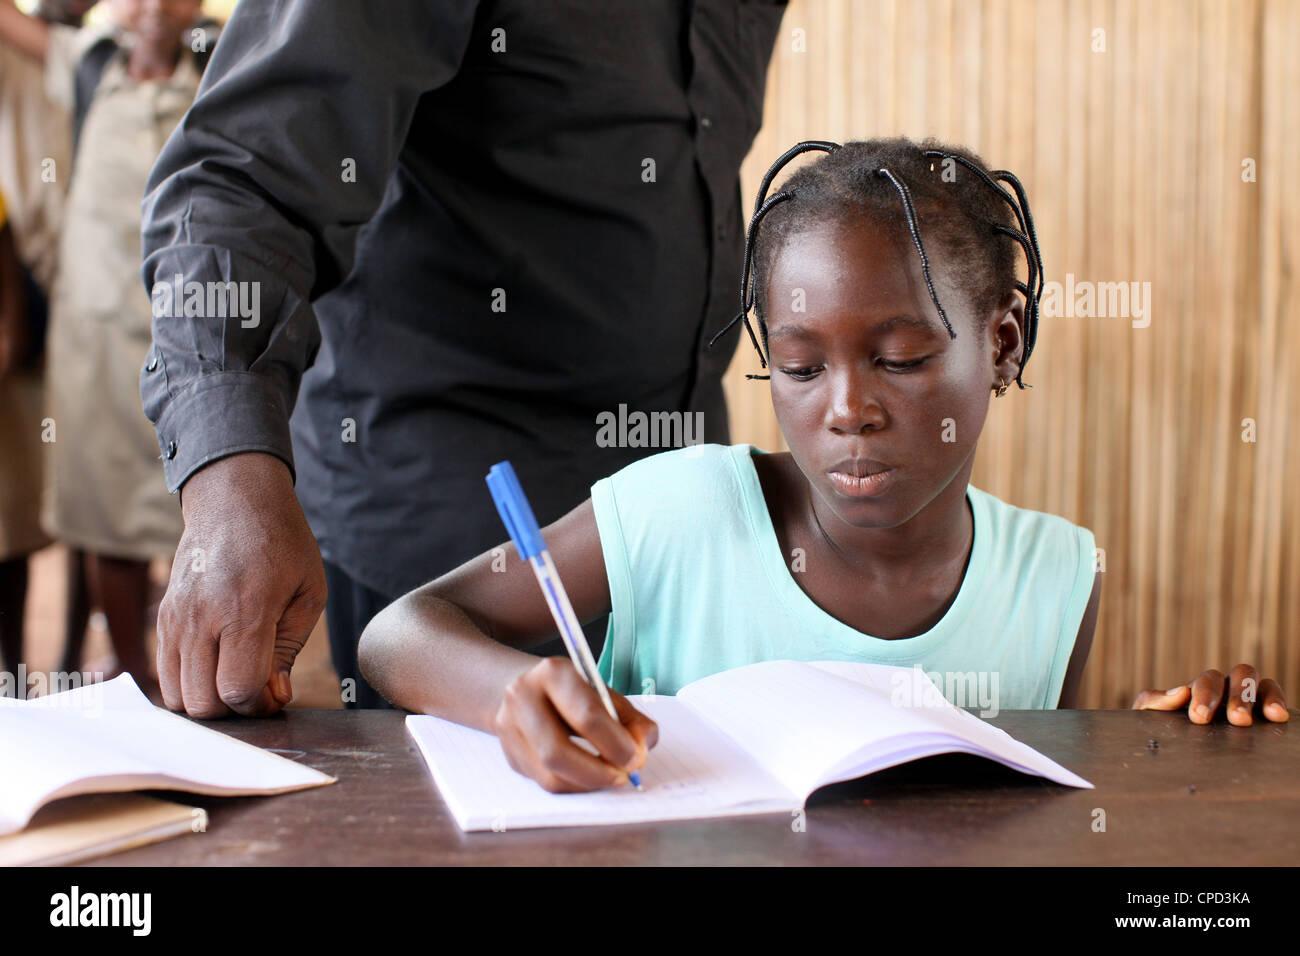 Secondary school in Africa, Hevie, Benin, West Africa, Africa - Stock Image